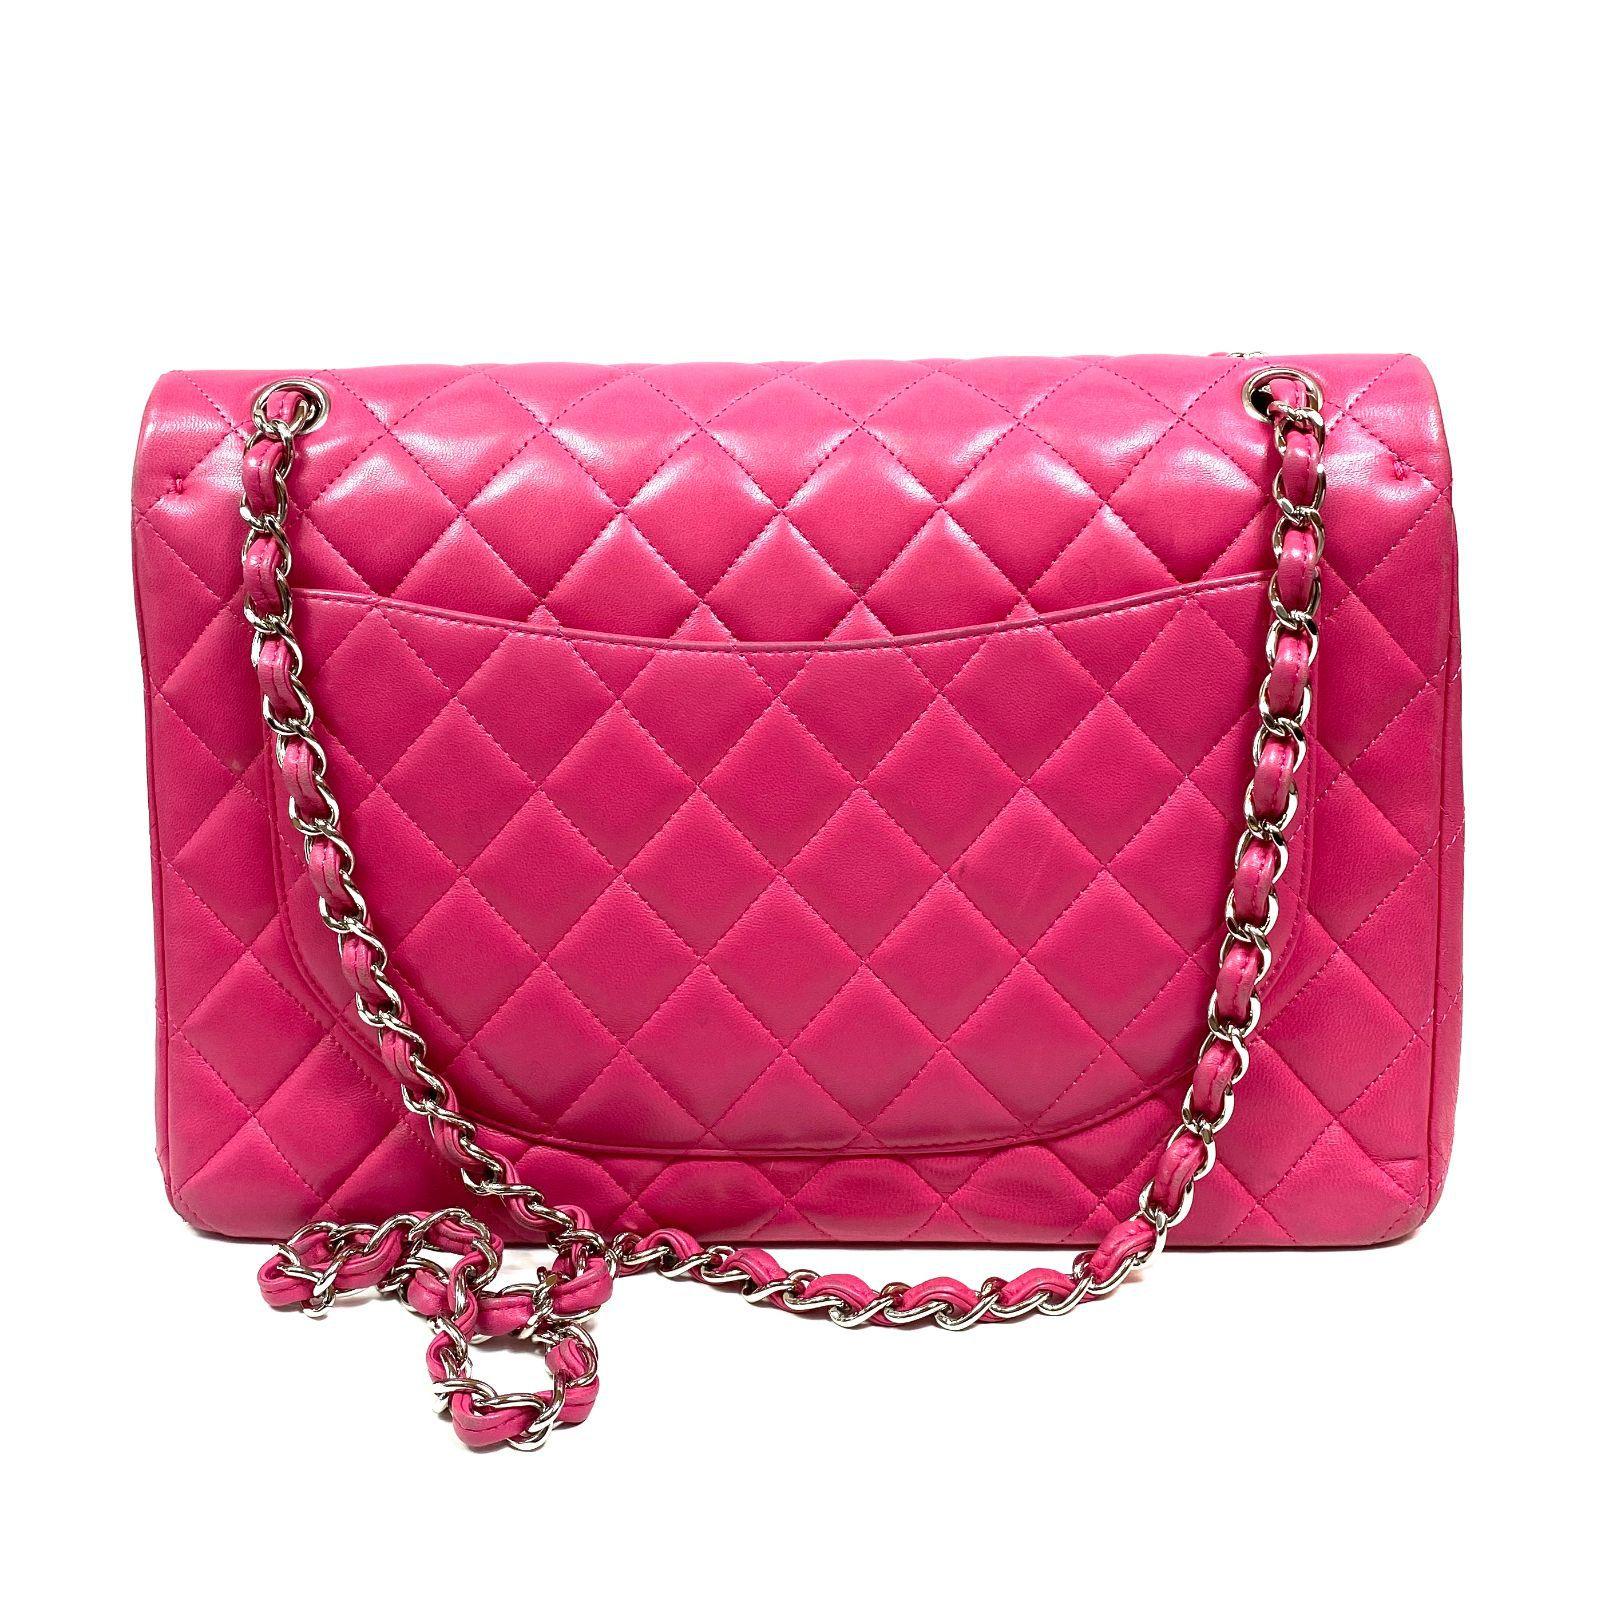 Bolsa Chanel Jumbo Lambskin 2.55 Rosa